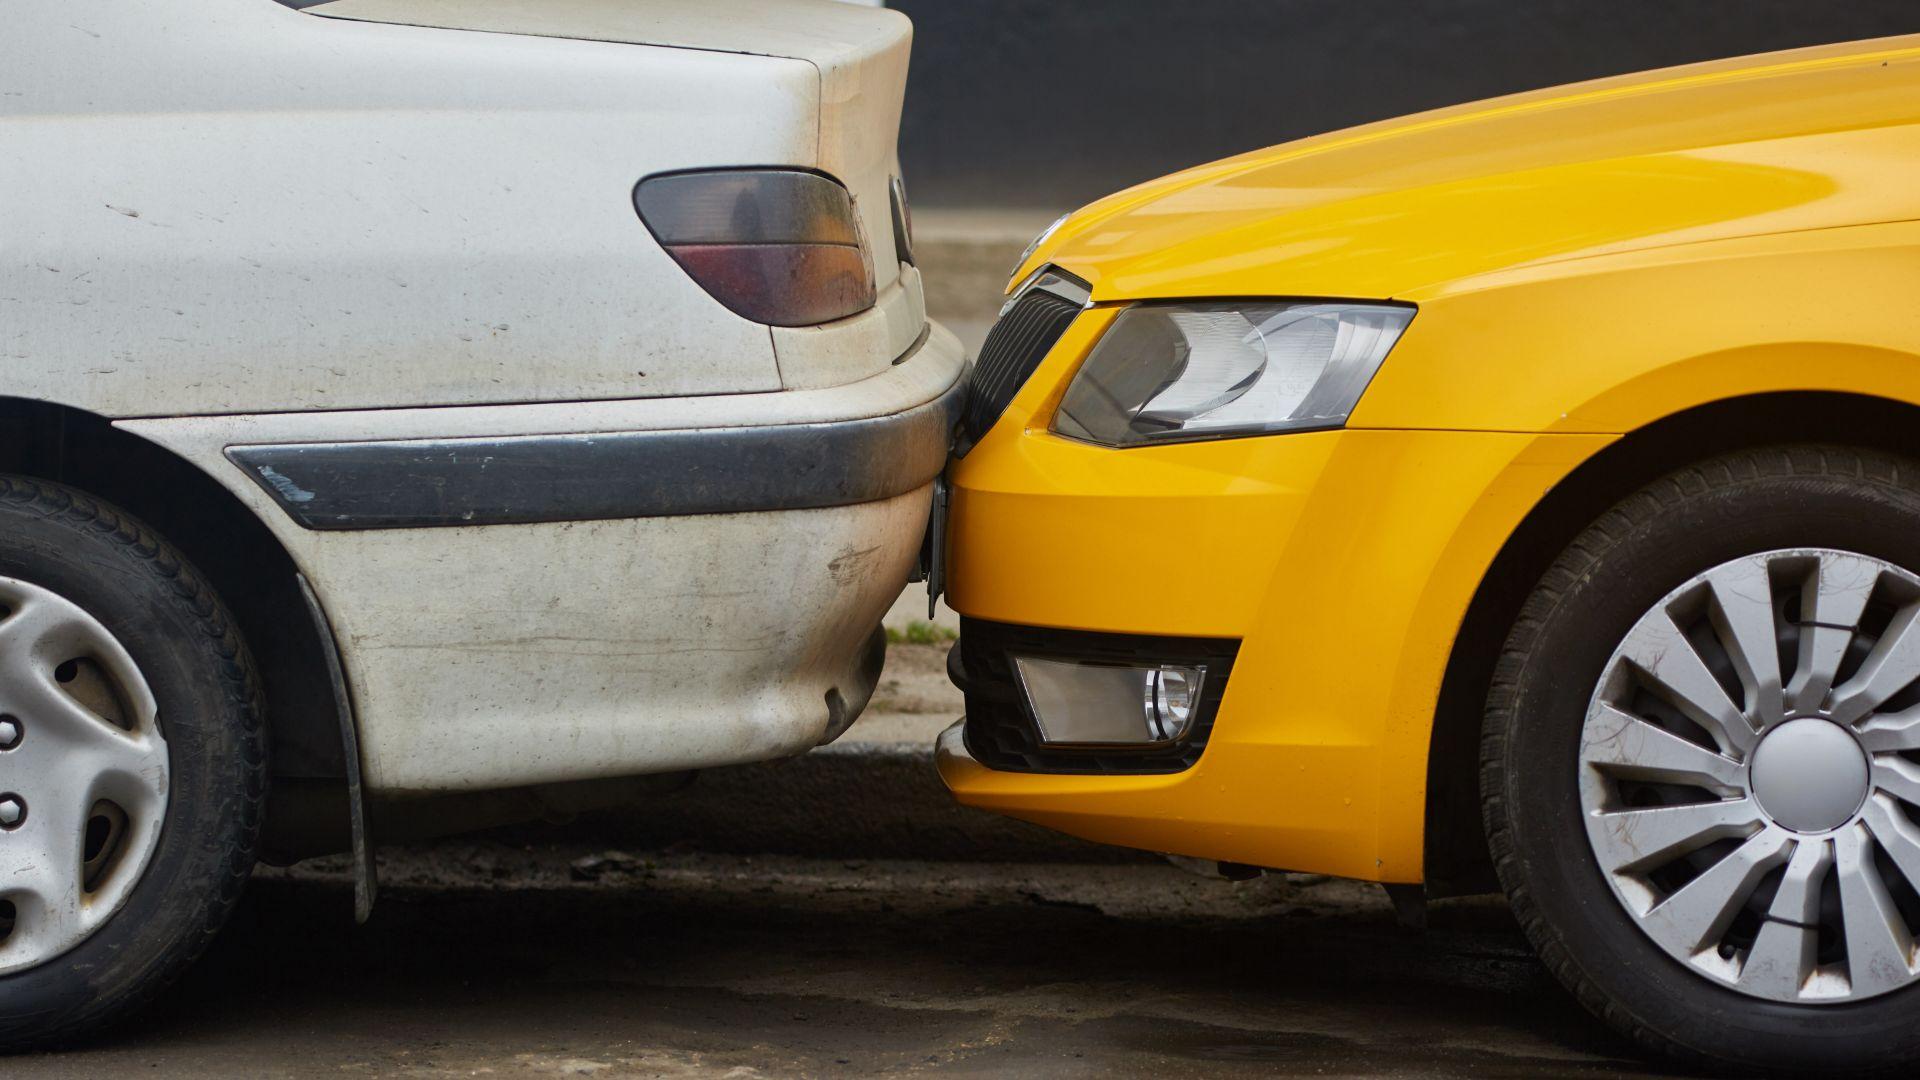 How to avoid parking prangs